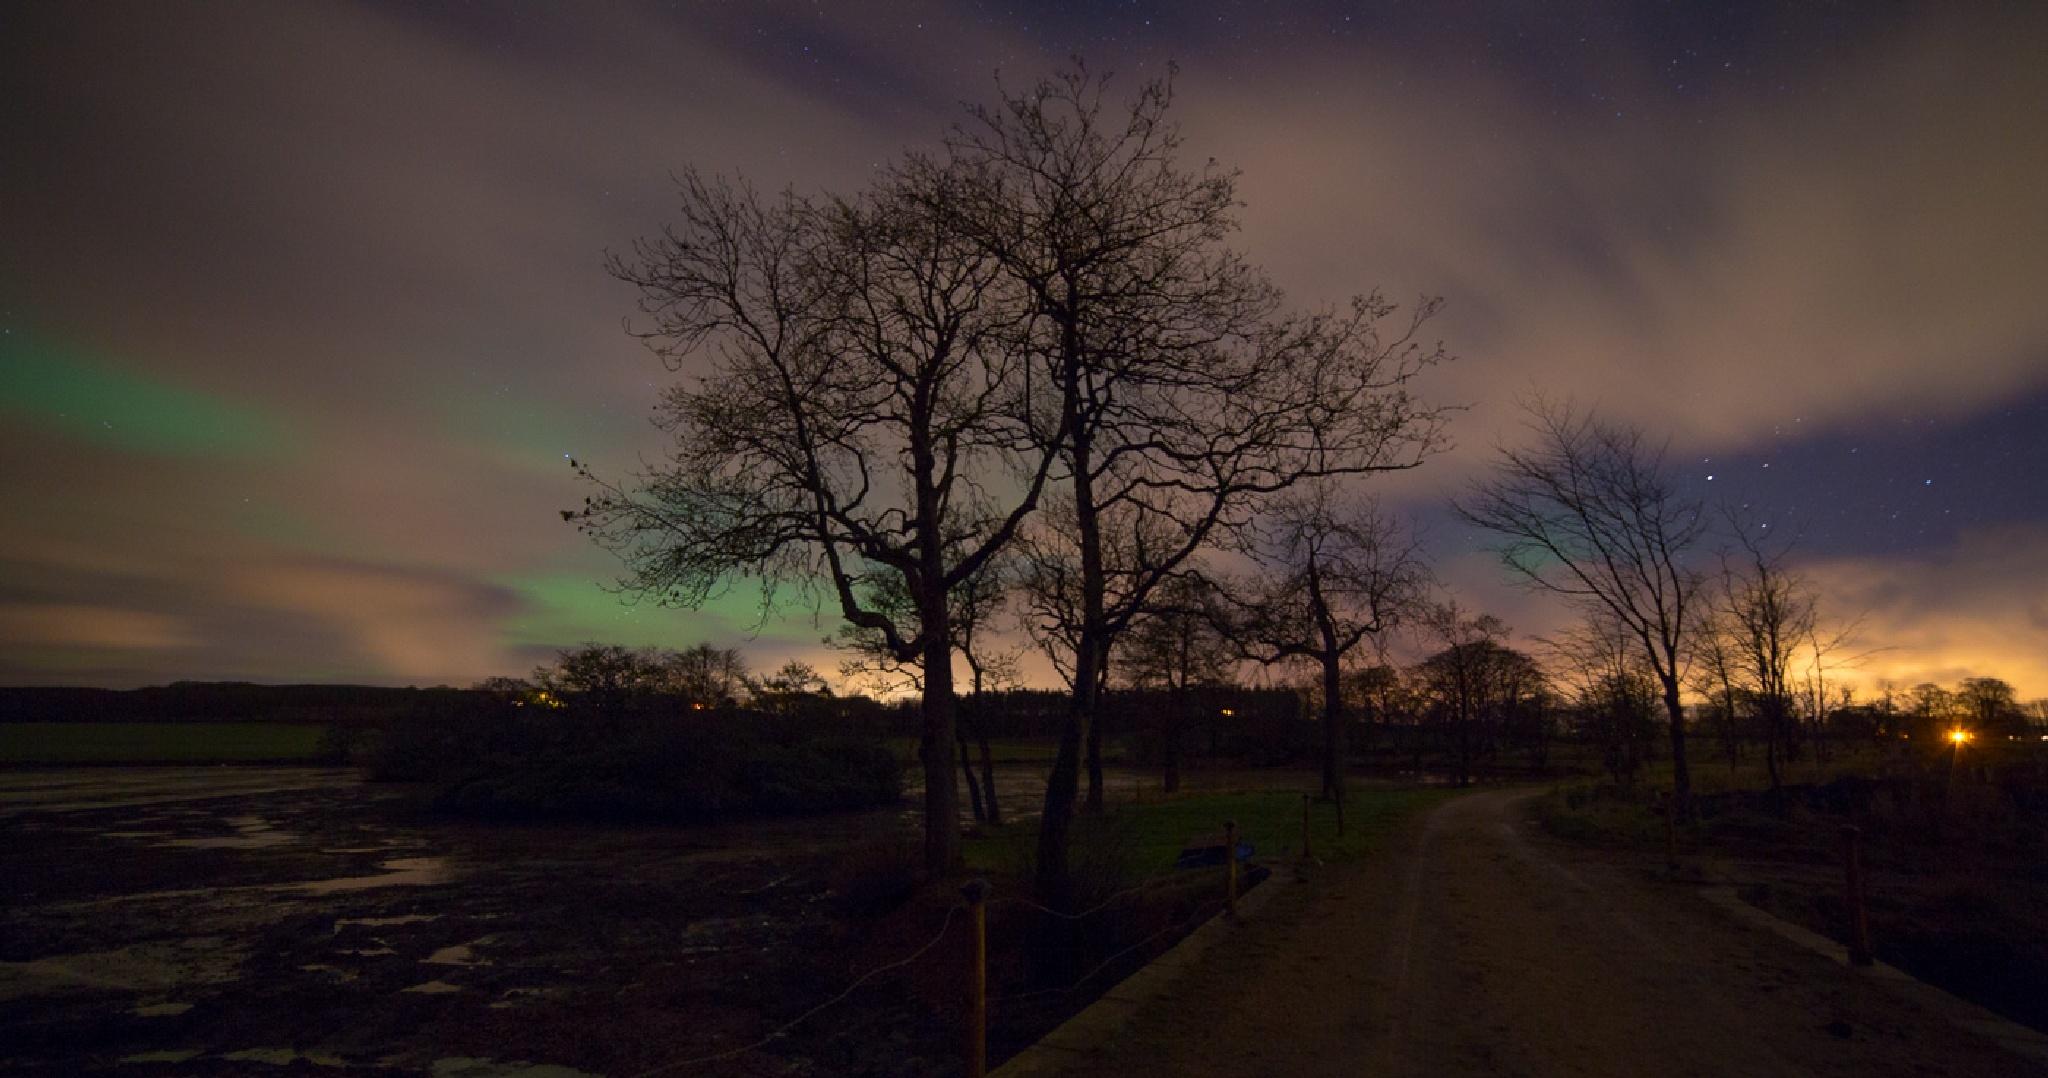 night rainbow 2 by fiona